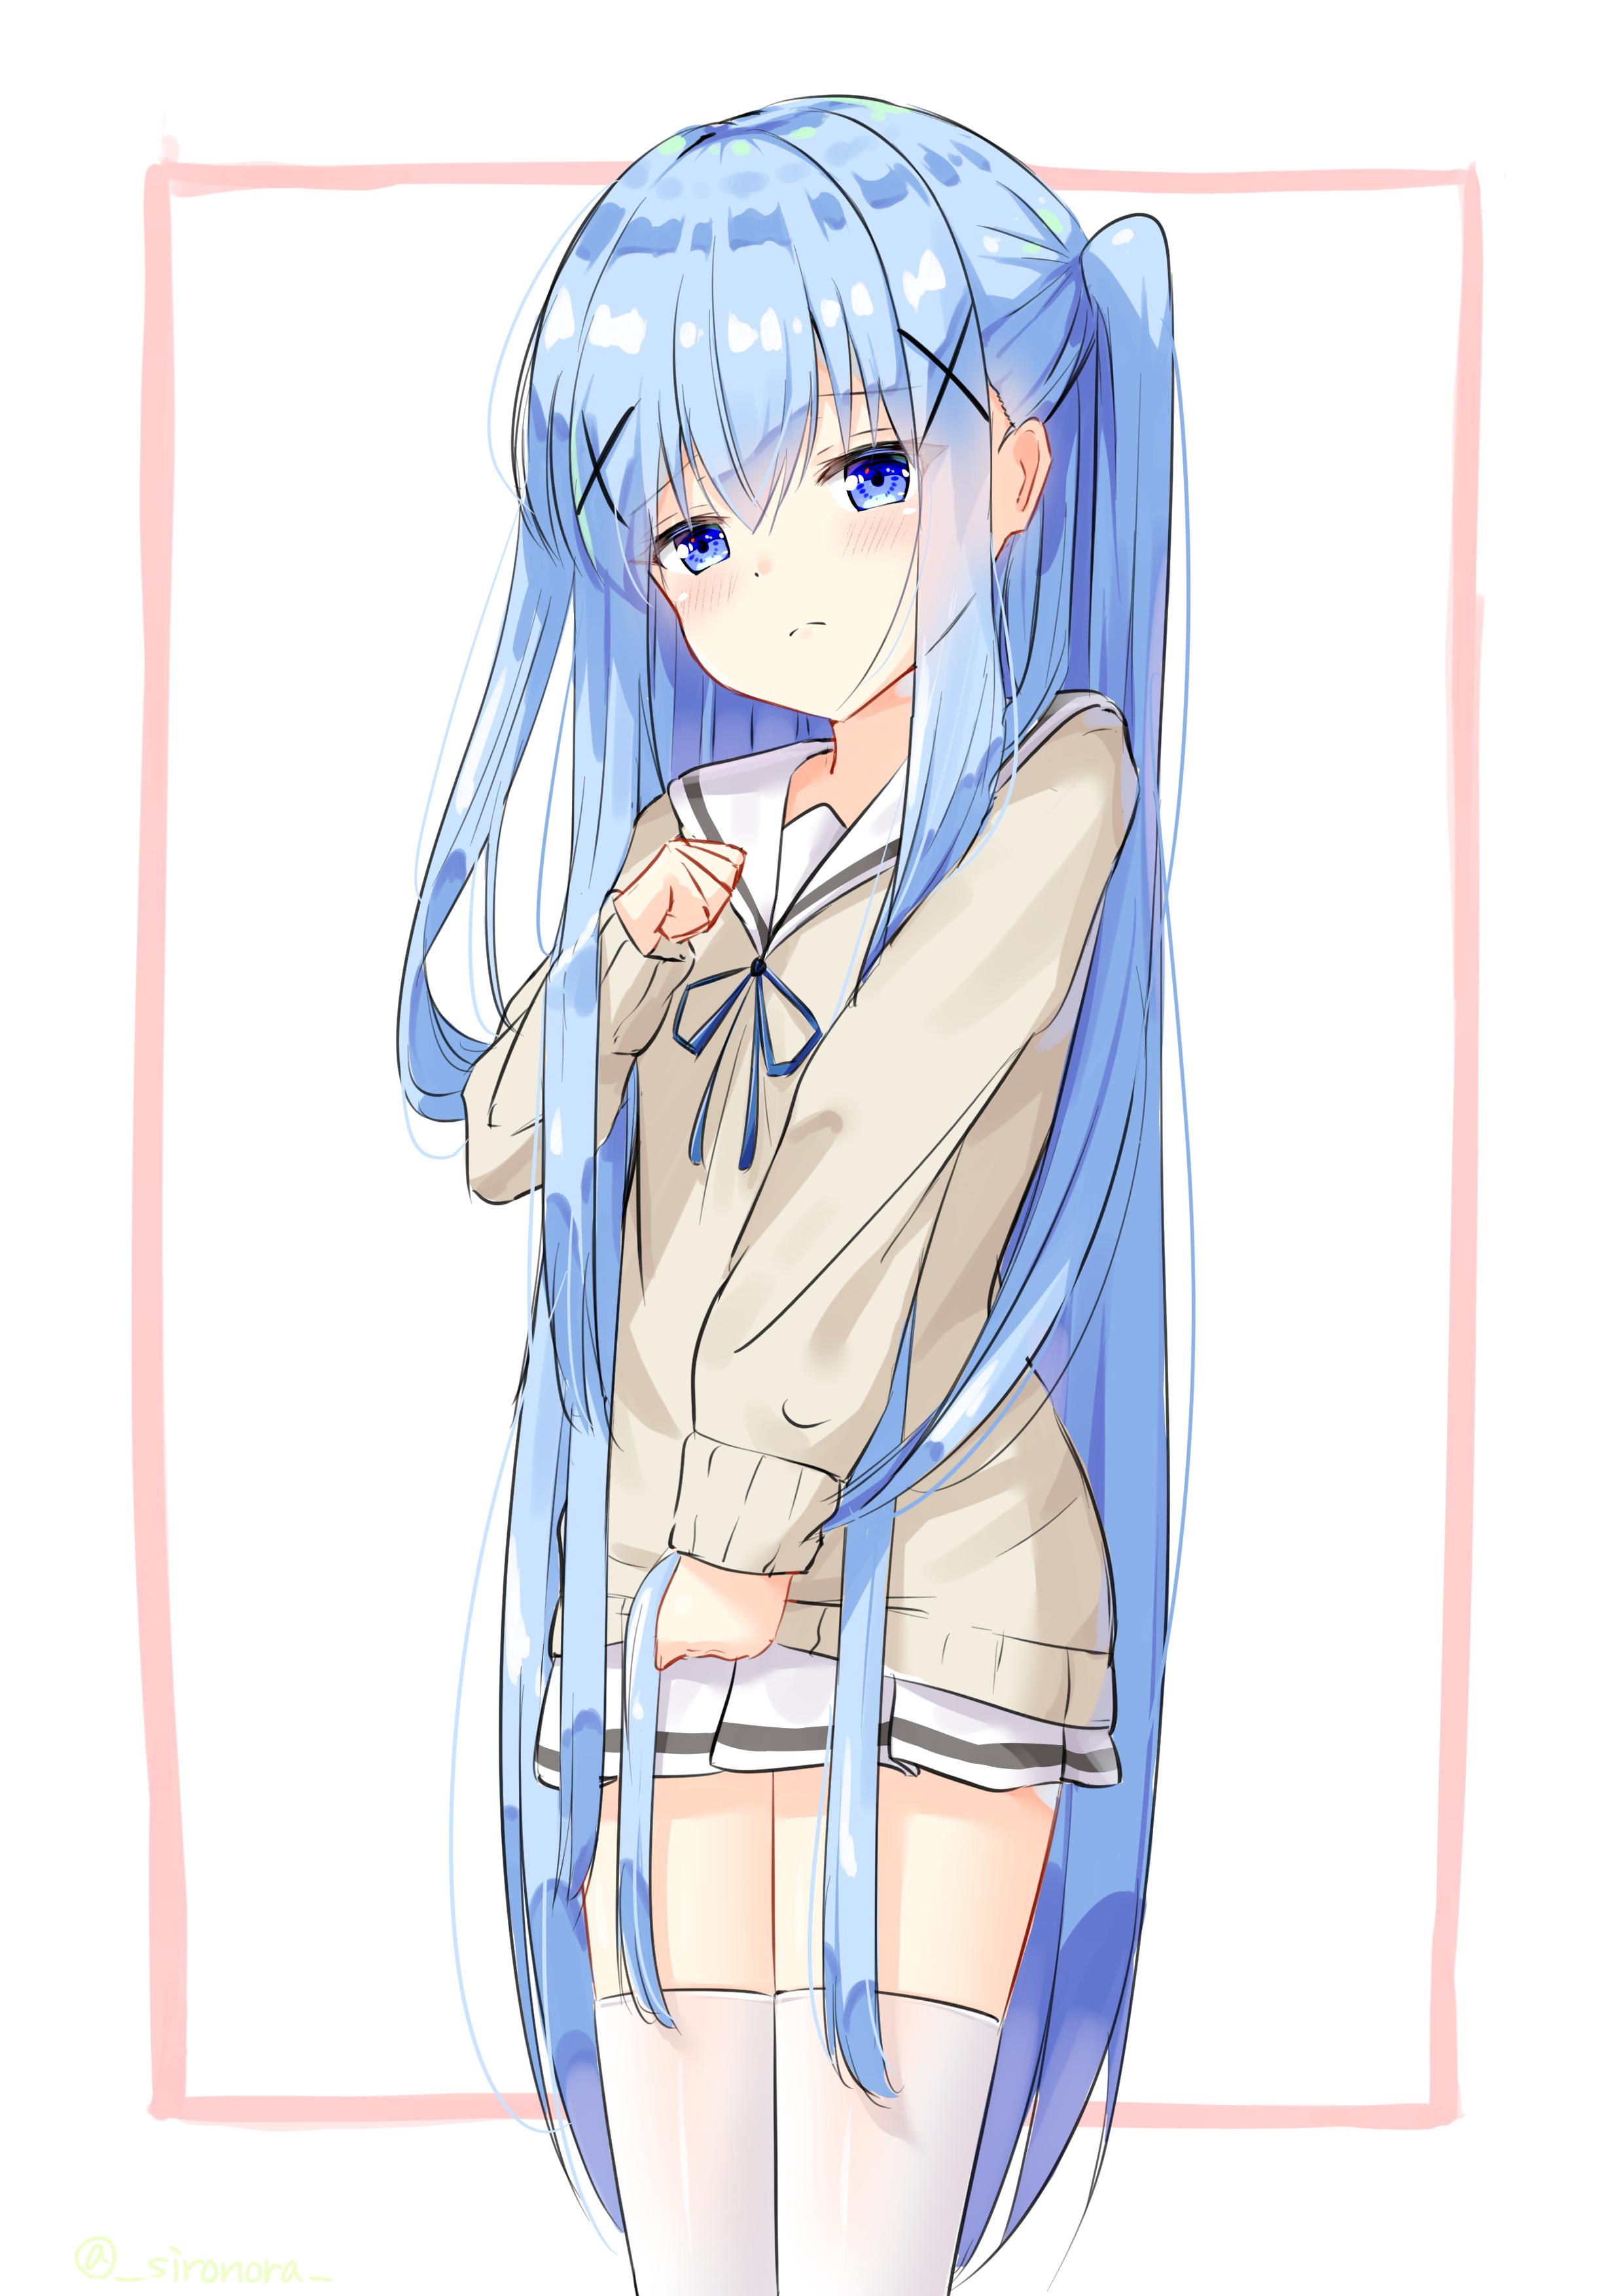 long-haired chino-chan [Gochuumon wa Usagi Desu ka?]